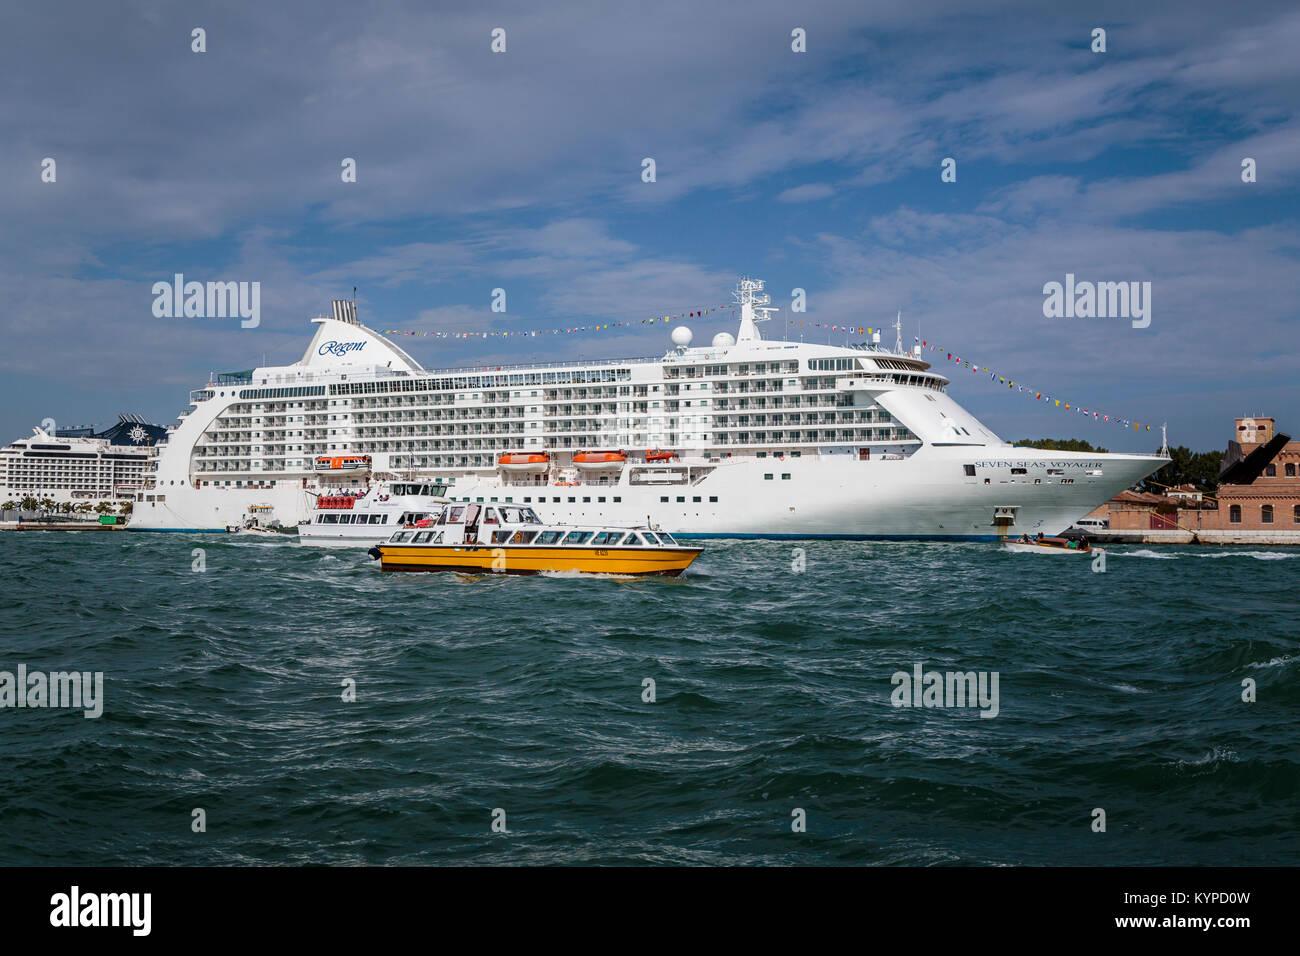 The Seven Seas Voyager Regent cruise ship docked in port in Veneto, Venice, Italy, Europe. - Stock Image